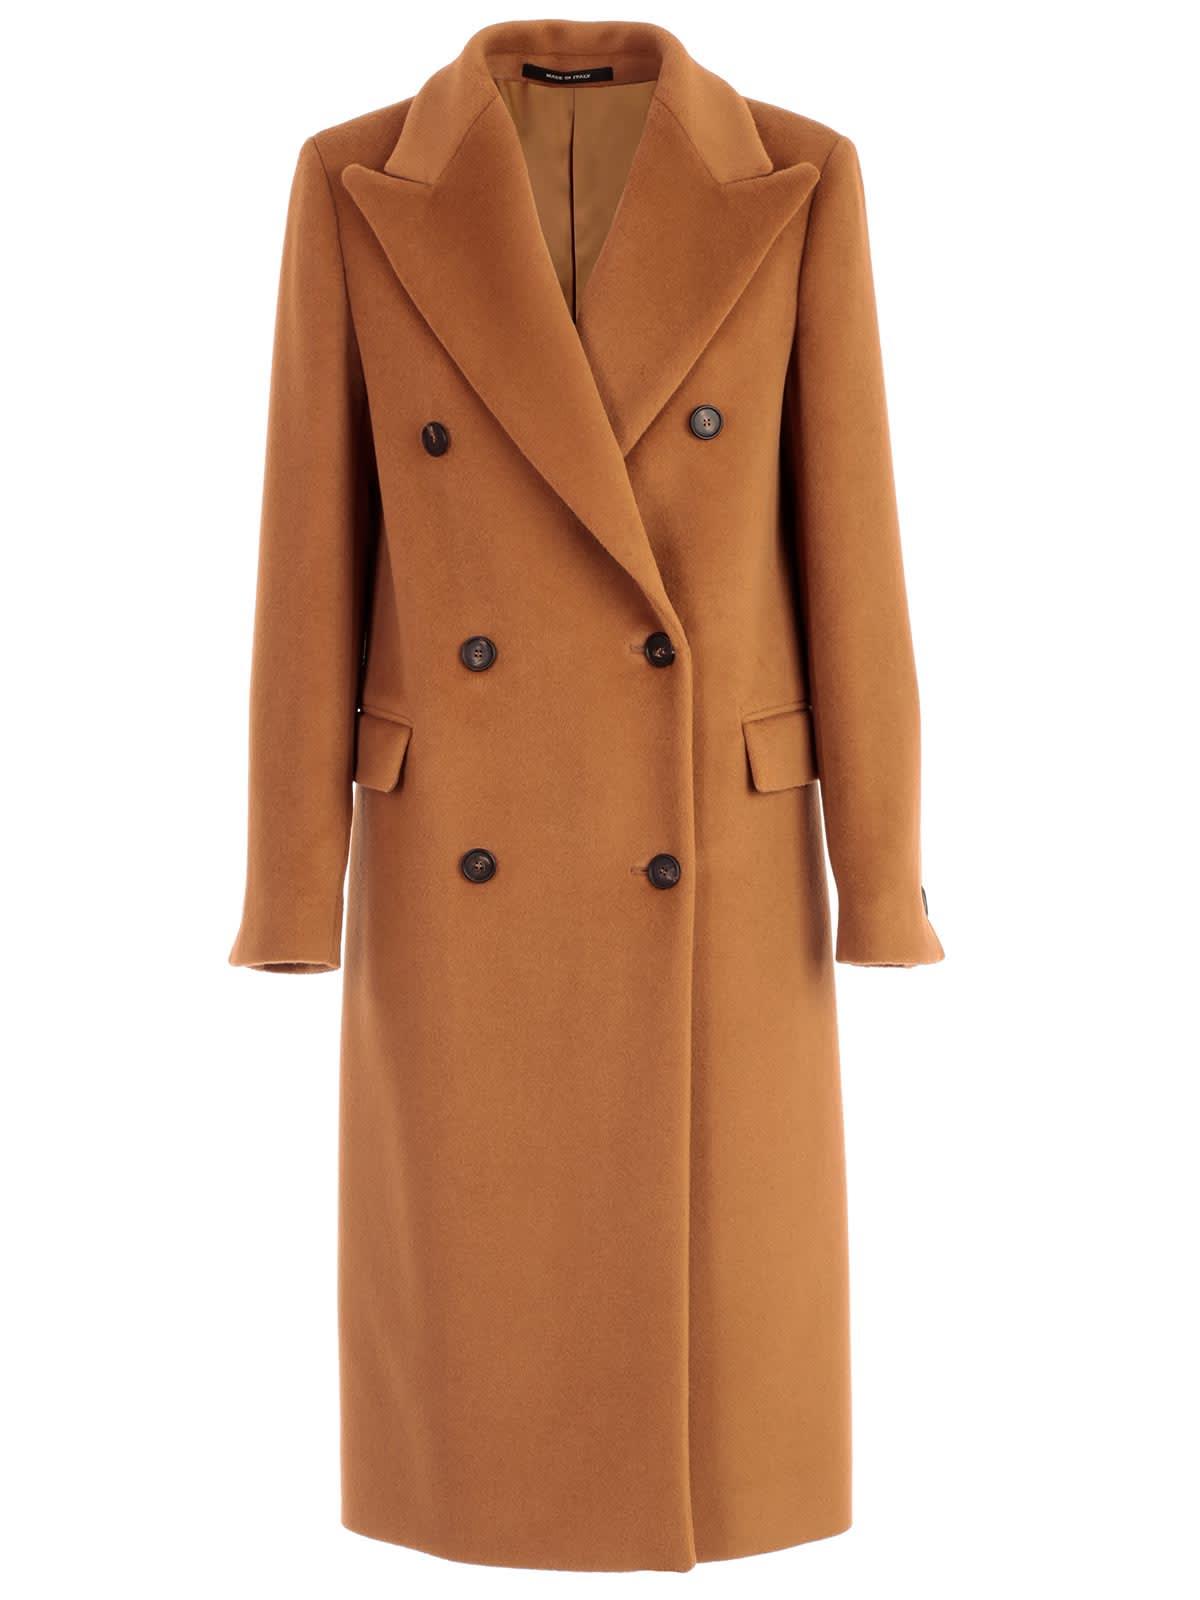 Photo of  Tagliatore Coat Double Breasted W/belt- shop Tagliatore jackets online sales